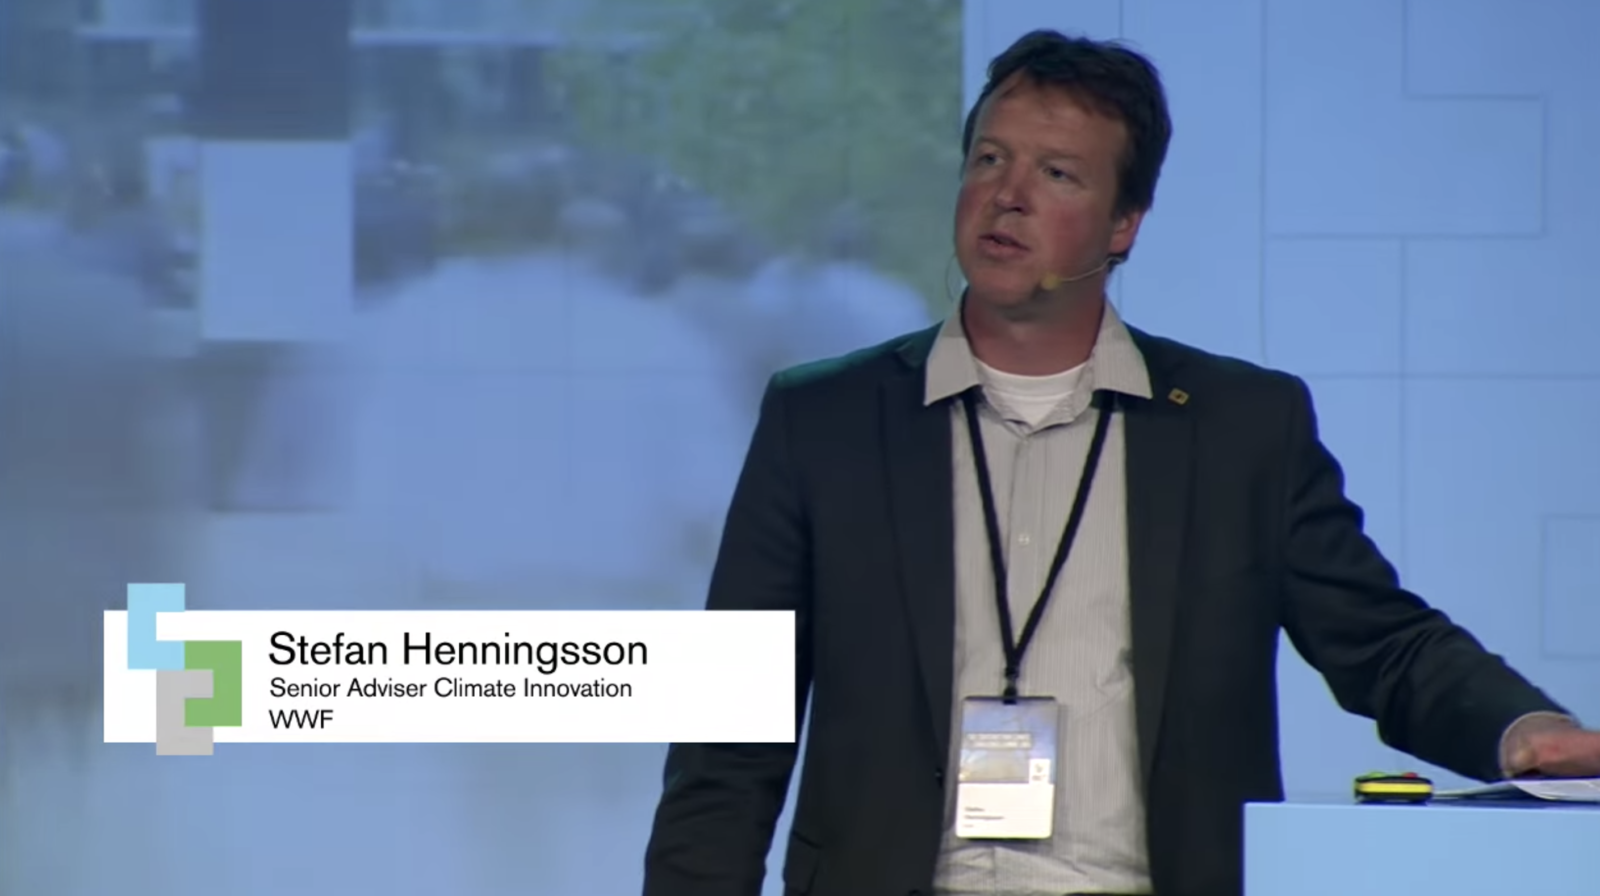 Stefan Henningsson